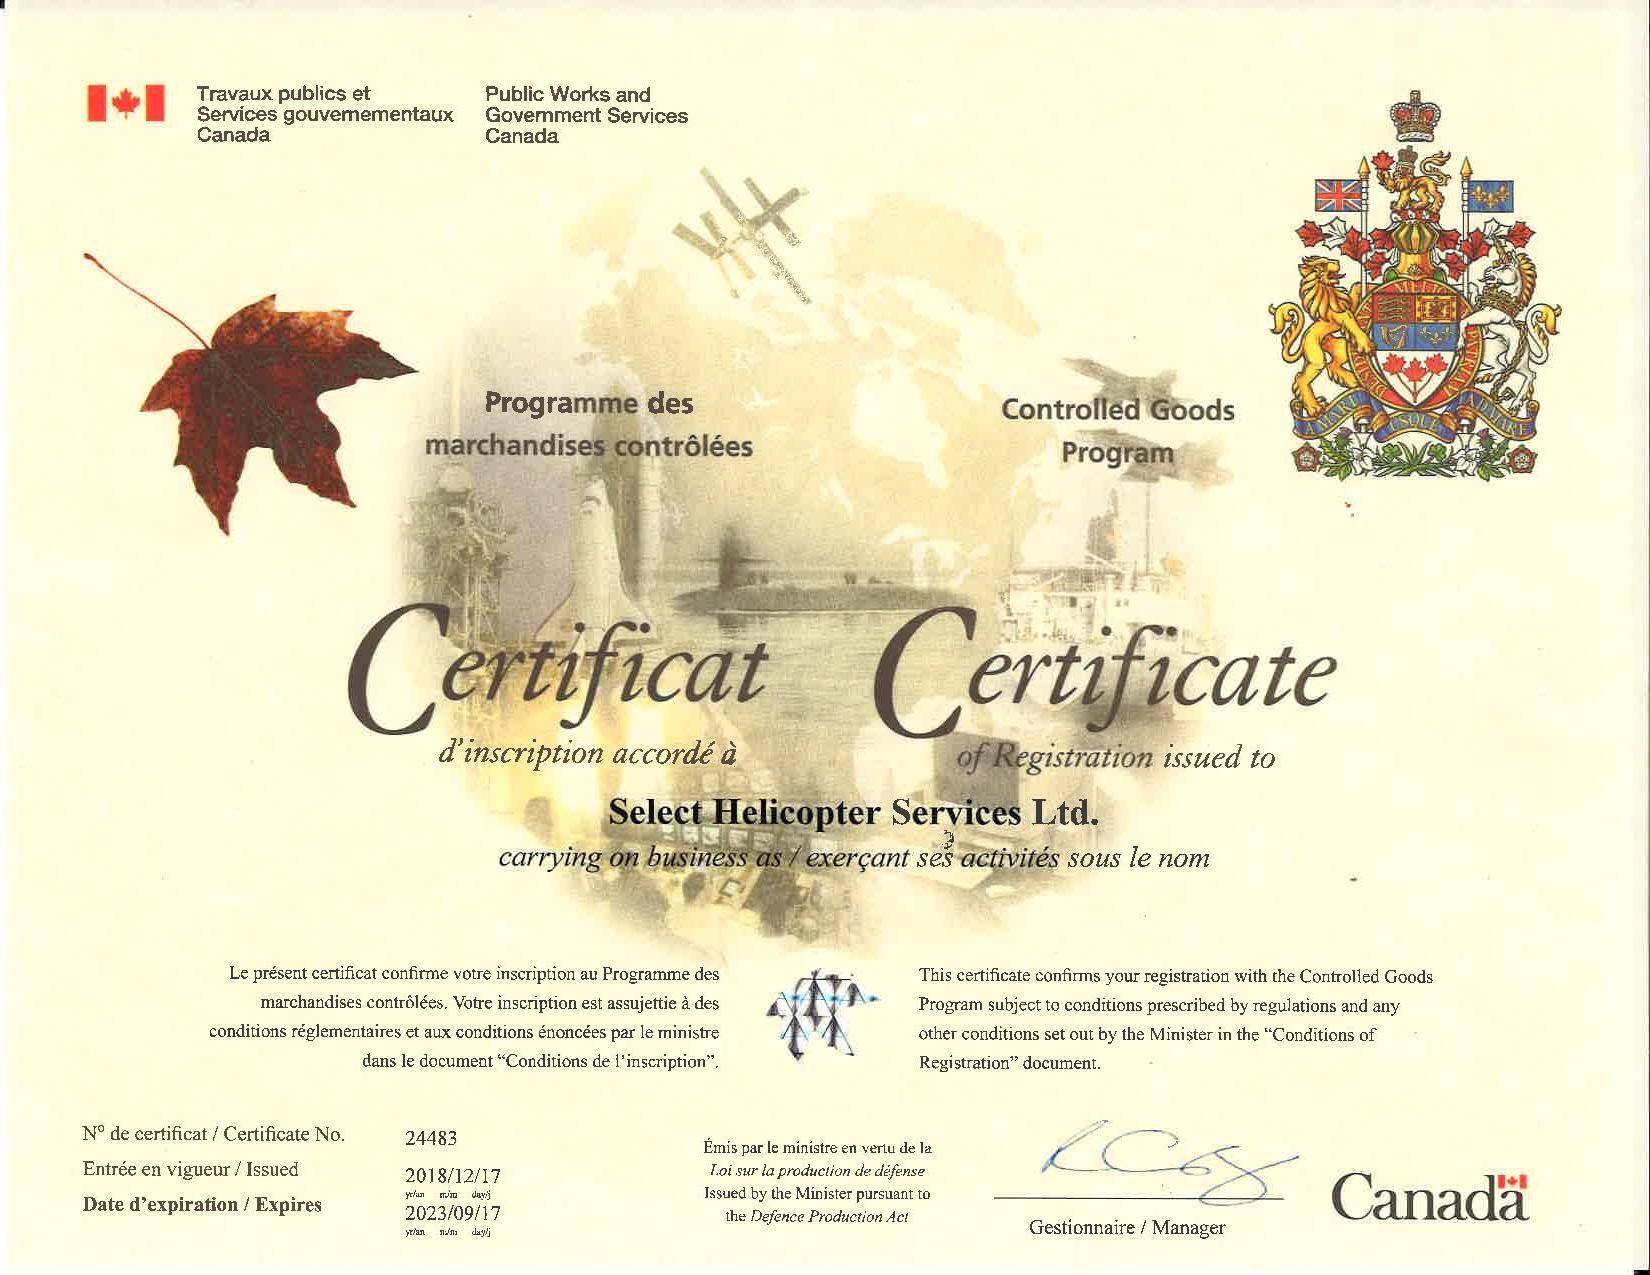 Controlled Goods Program Certificate.jpg